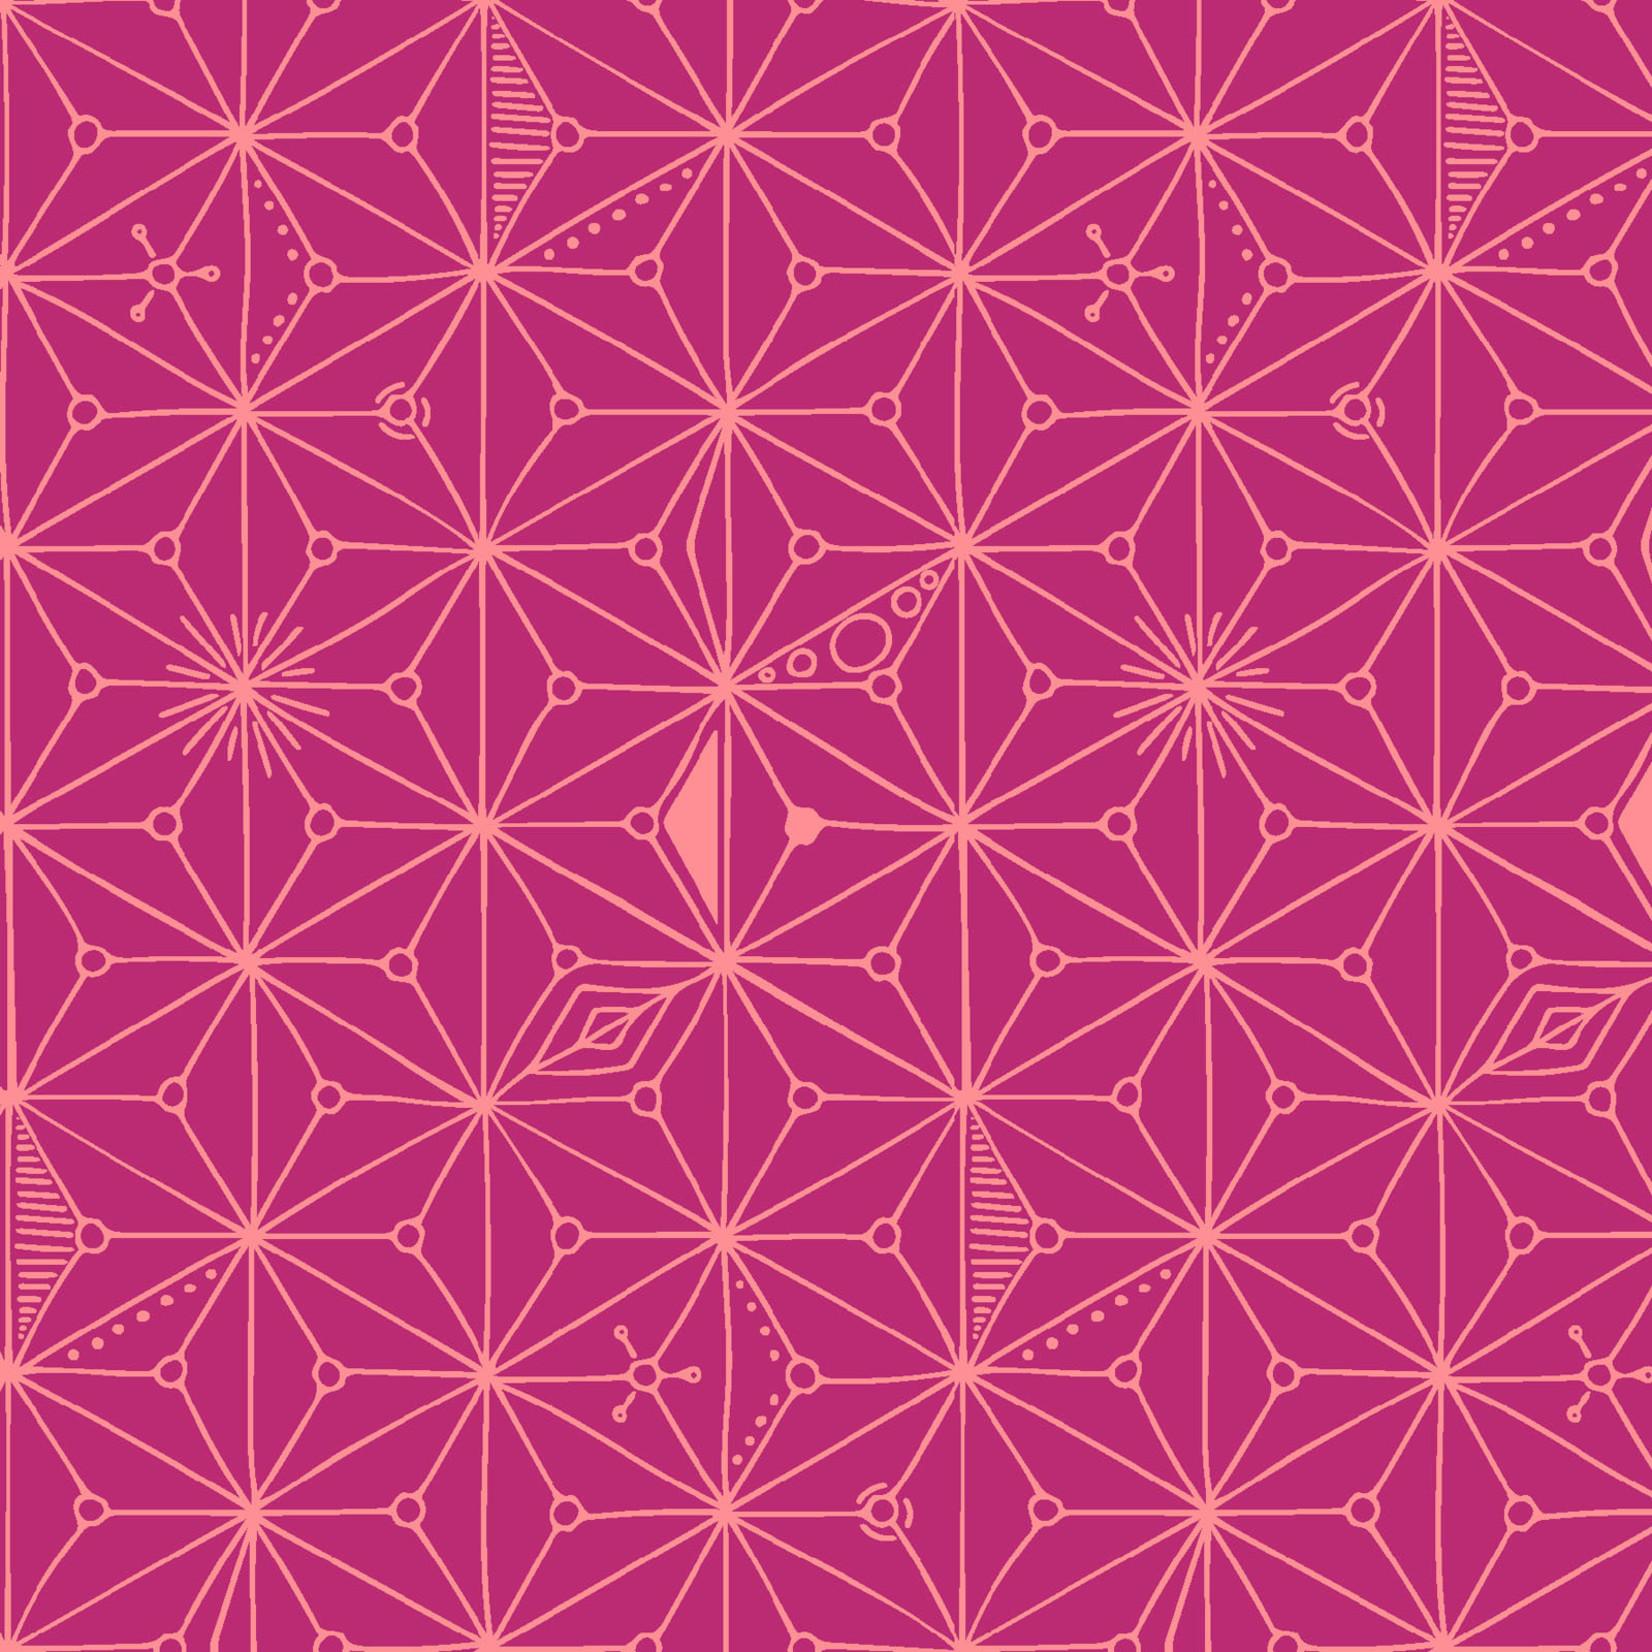 Maywood MOONGATE, CONTINUUM Pink (Geometric), per cm or $18/m